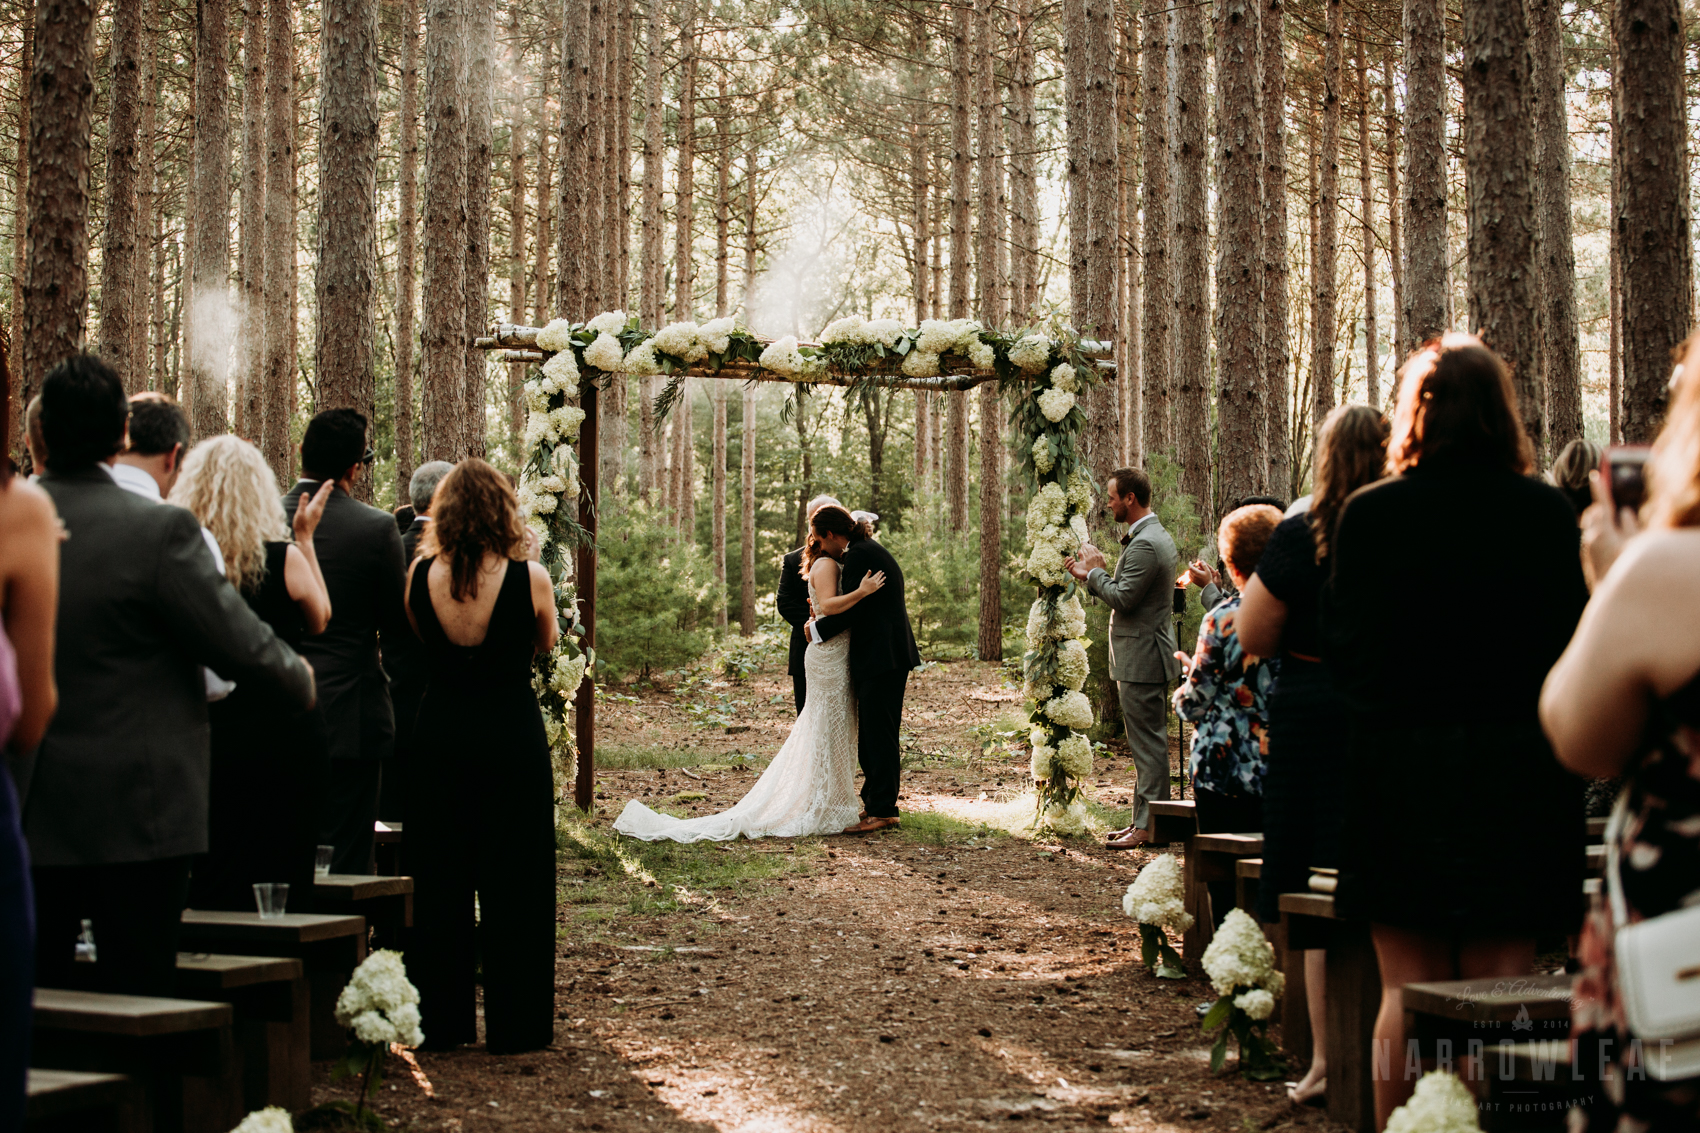 woodsy-boho-wedding-ceremony-burlap-and-bells-wi-NarrowLeaf_Love_&_Adventure_Photography-11.jpg